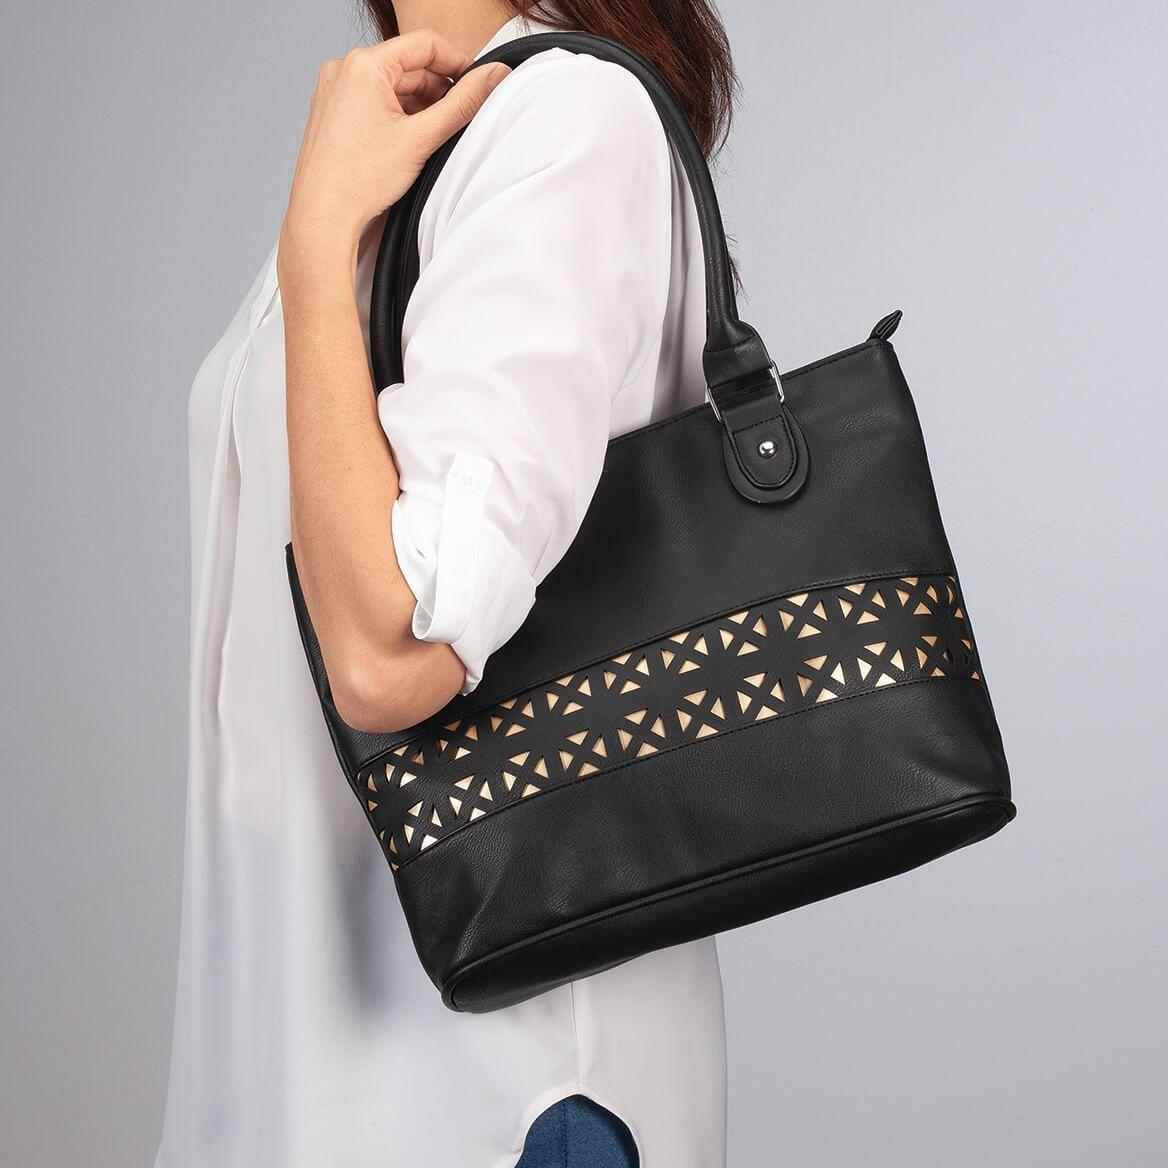 Laser Cut Shoulder Handbag-369658